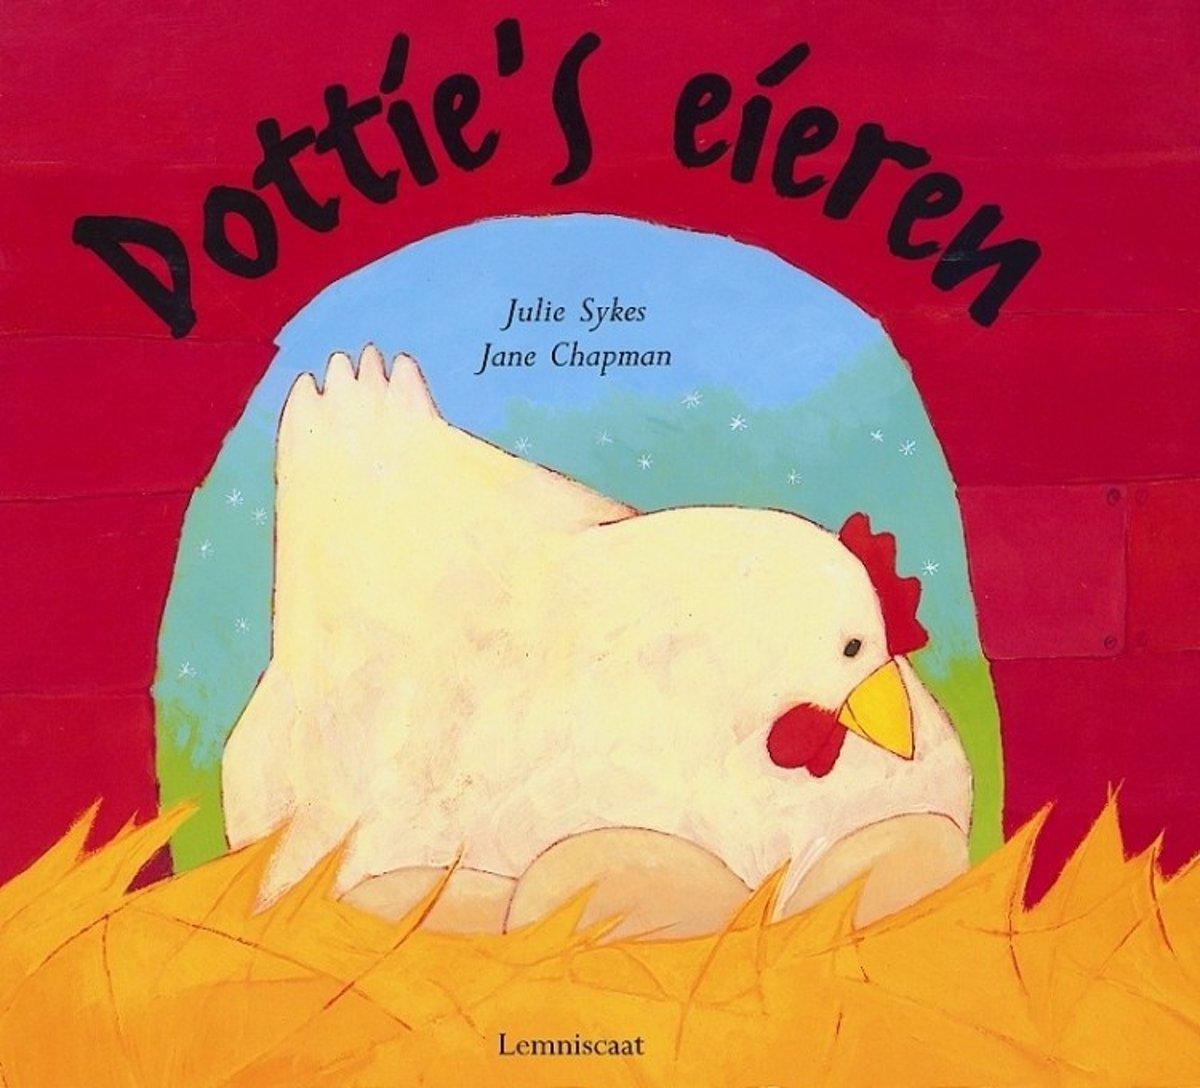 bol.com | Dottie's eieren, Julie Sykes | 9789056370633 | Boeken